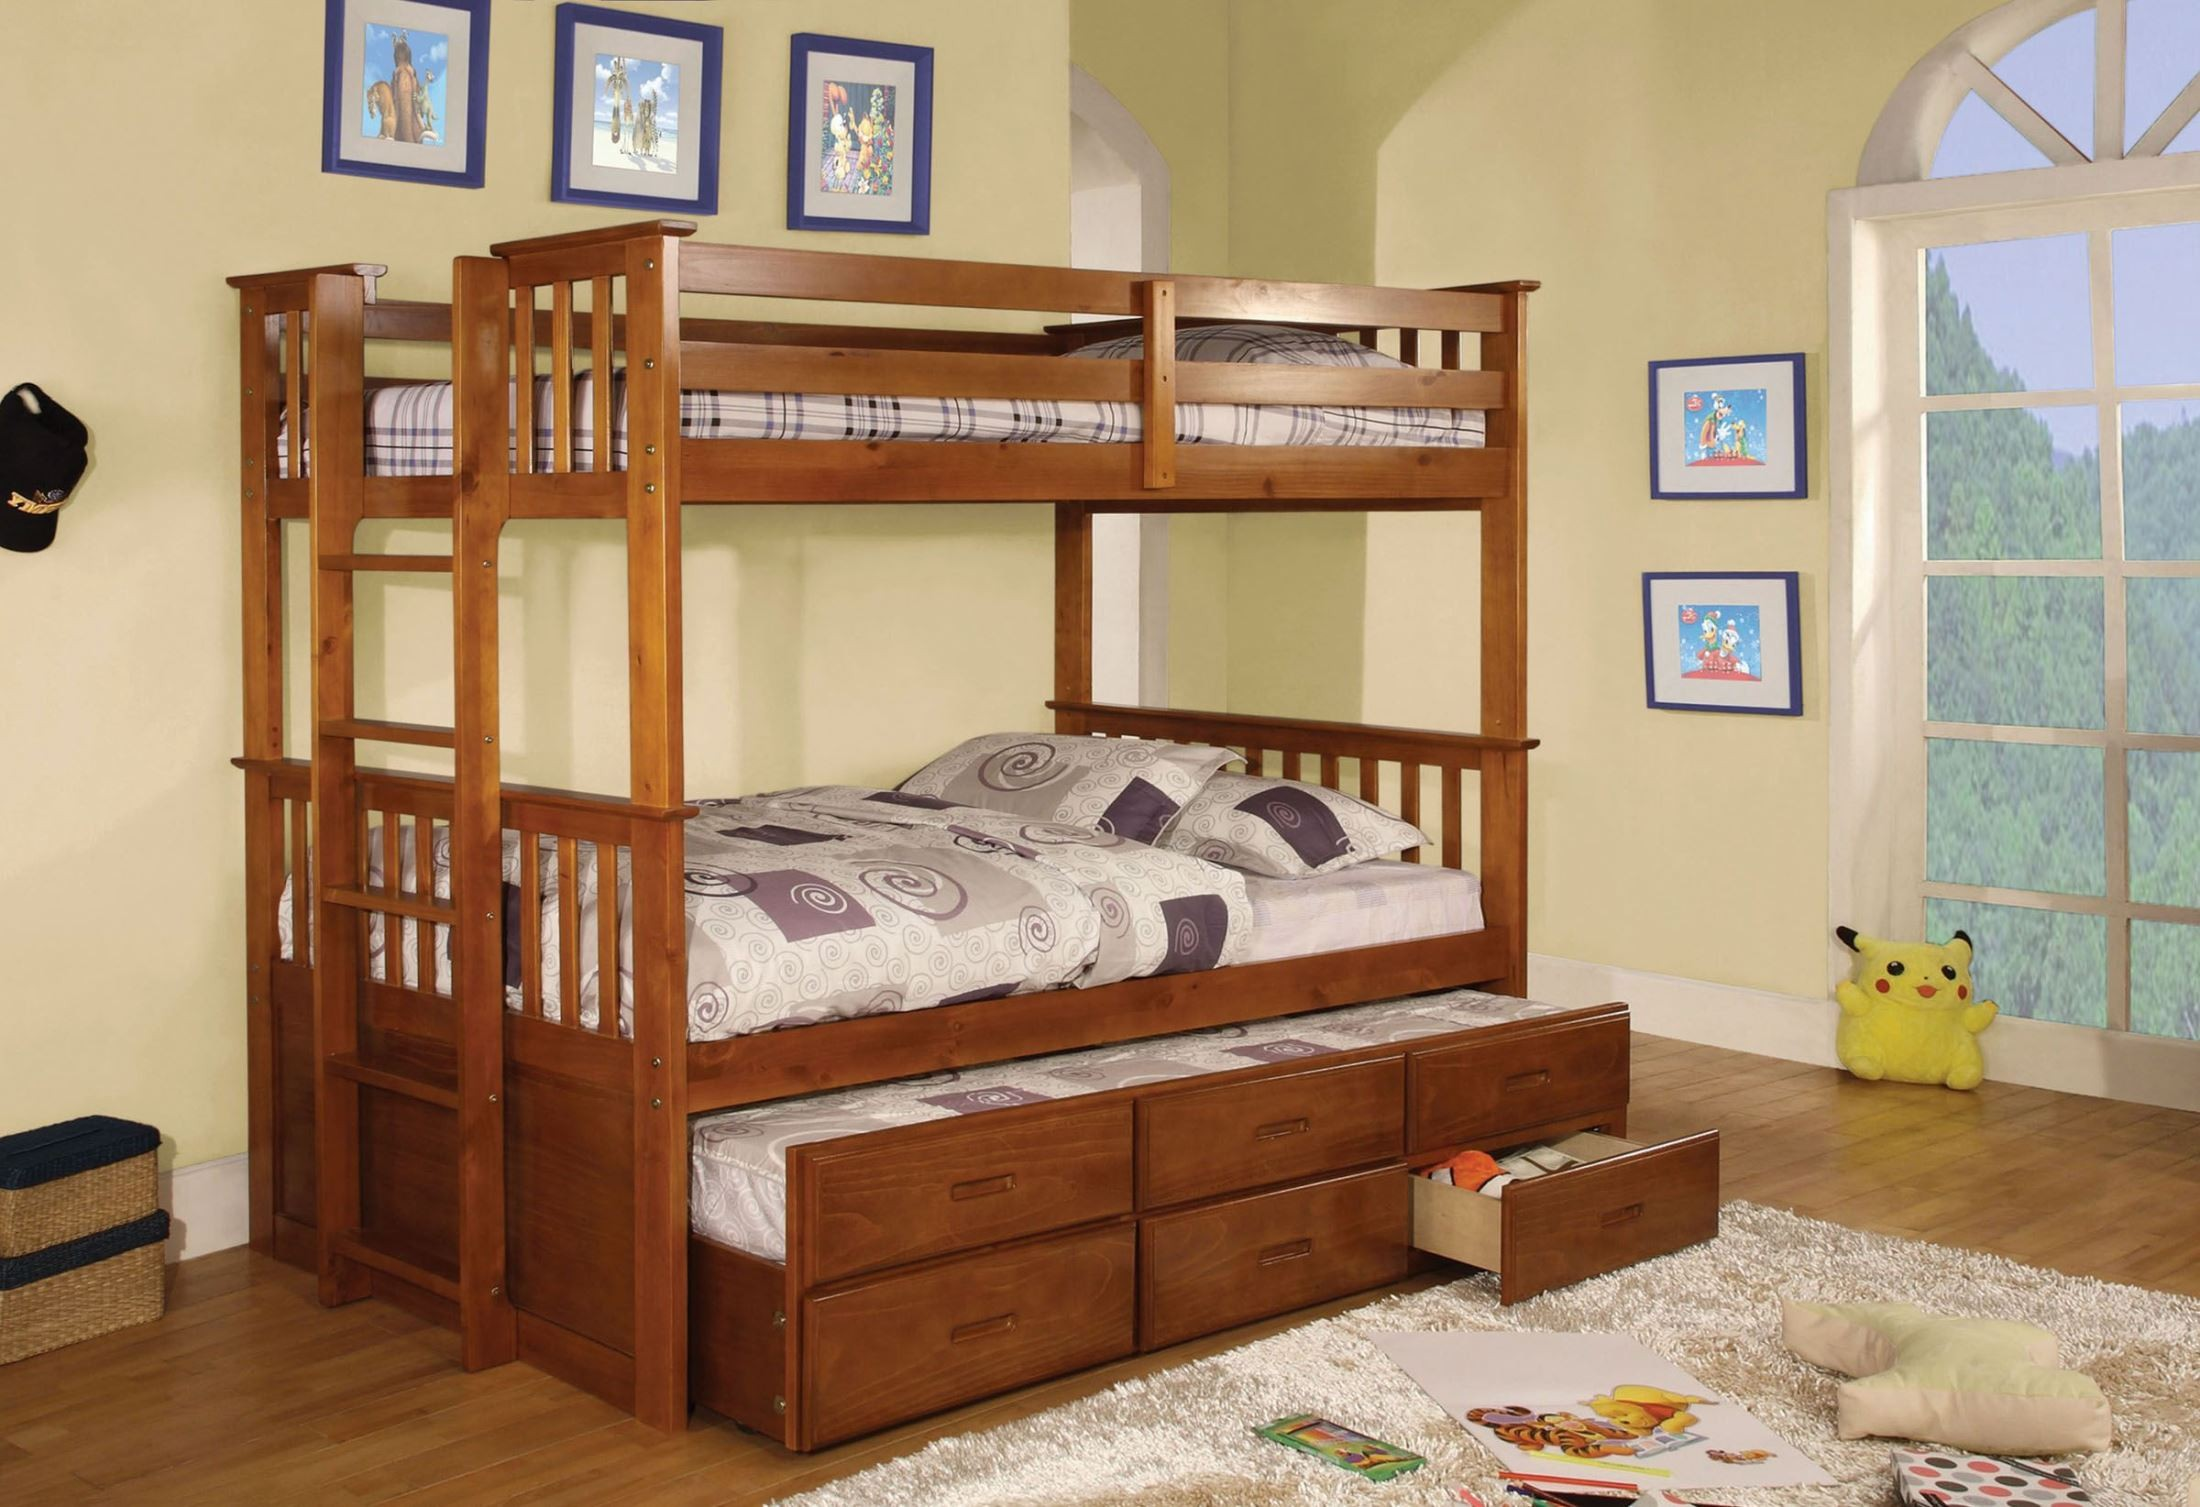 University I Oak Twin Over Twin Bunk Bed From Furniture Of America (CM-BK458T-OAK-BED)